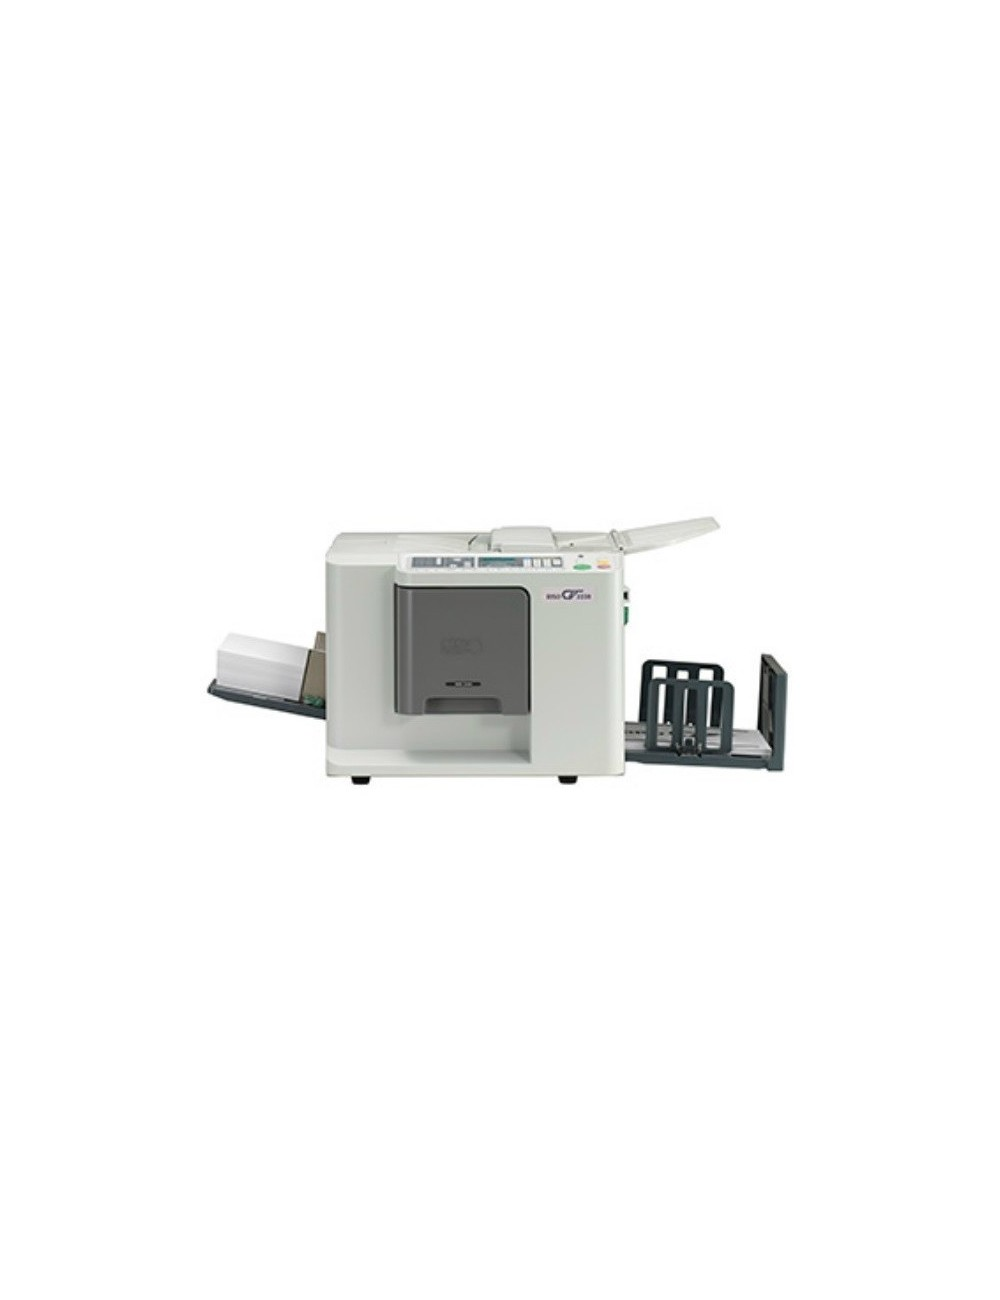 RISO CV 3230 Εκτυπωτικό Μηχάνημα Β4 7.800 φύλλα/ώρα